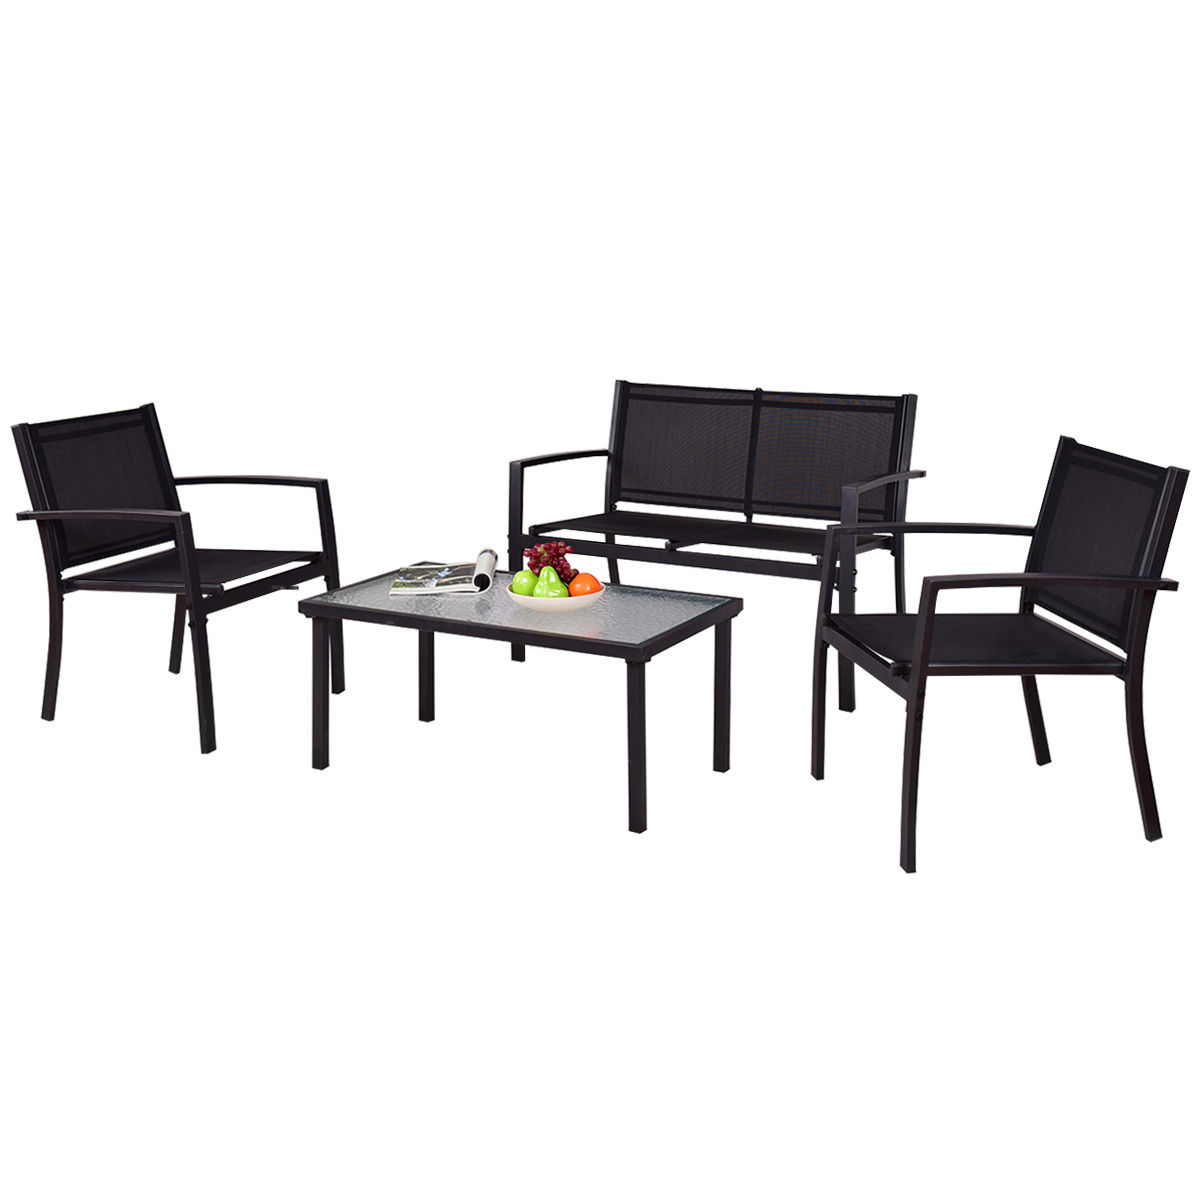 4 pcs Patio Steel Frame Coffee Table Furniture Set